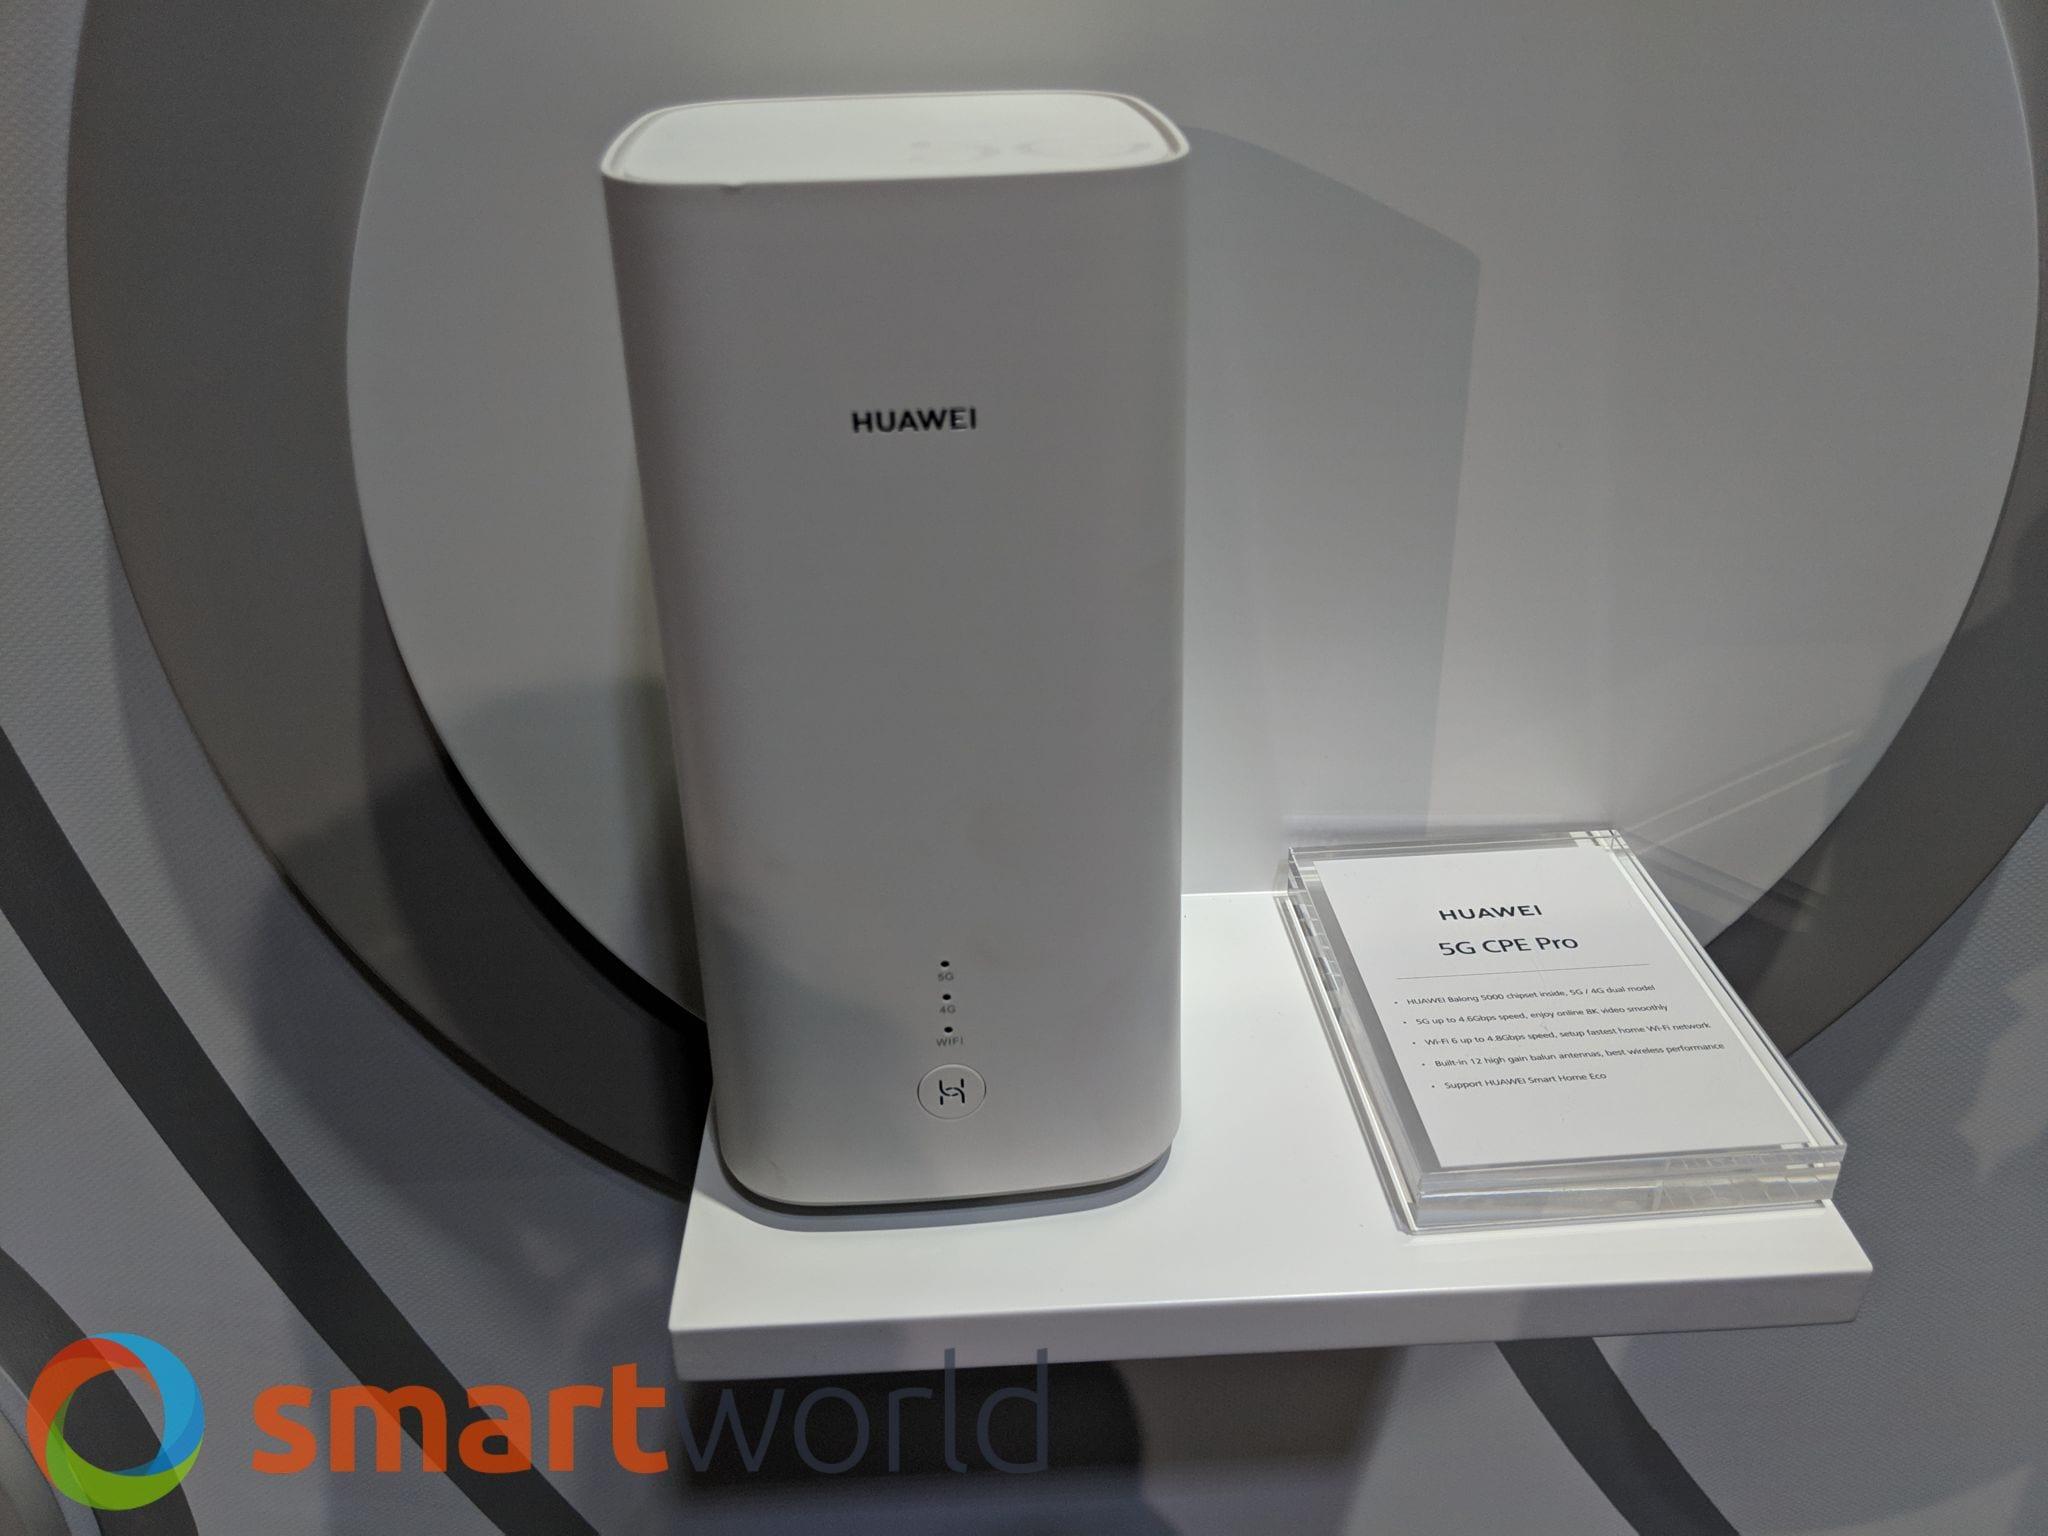 Modem-router 5G Huawei al MWC 2019 | SmartWorld